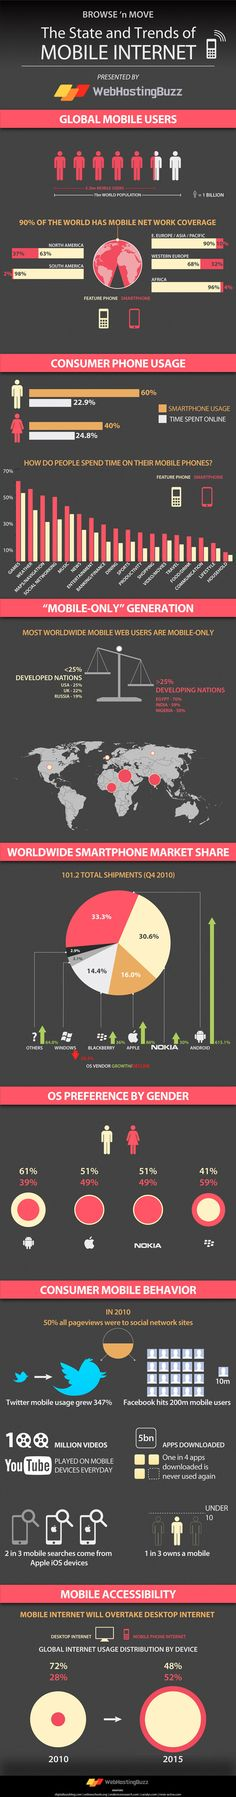 Estado y tendencias de Internet móvil #infografia #infographic#internet